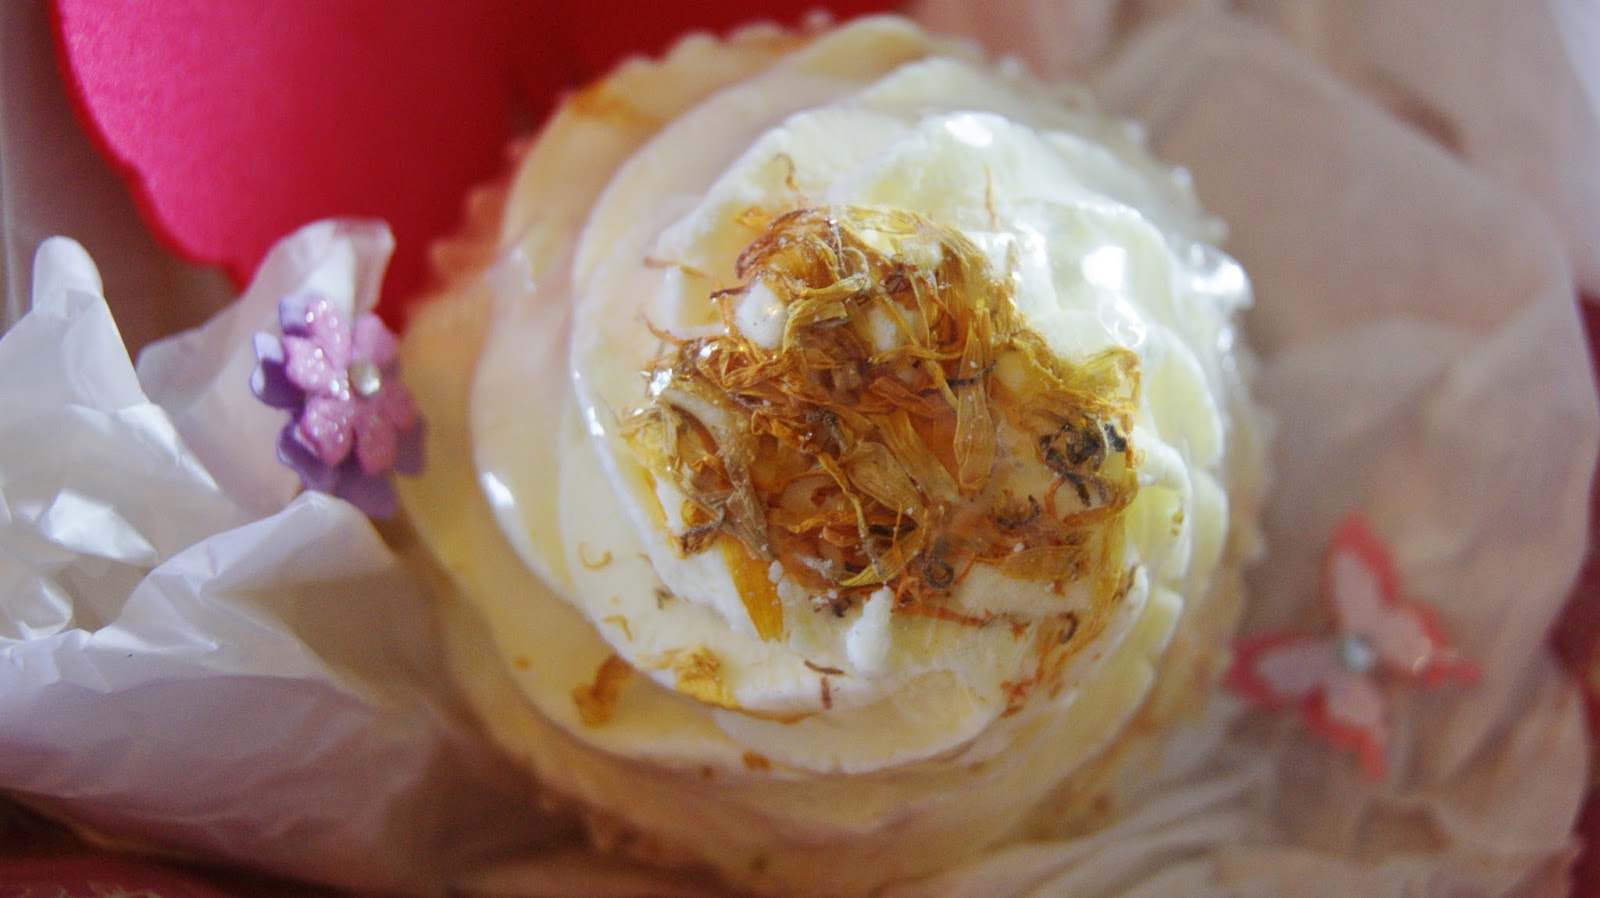 Bomb Cosmetics Milk & Honey Bath Brulee Review